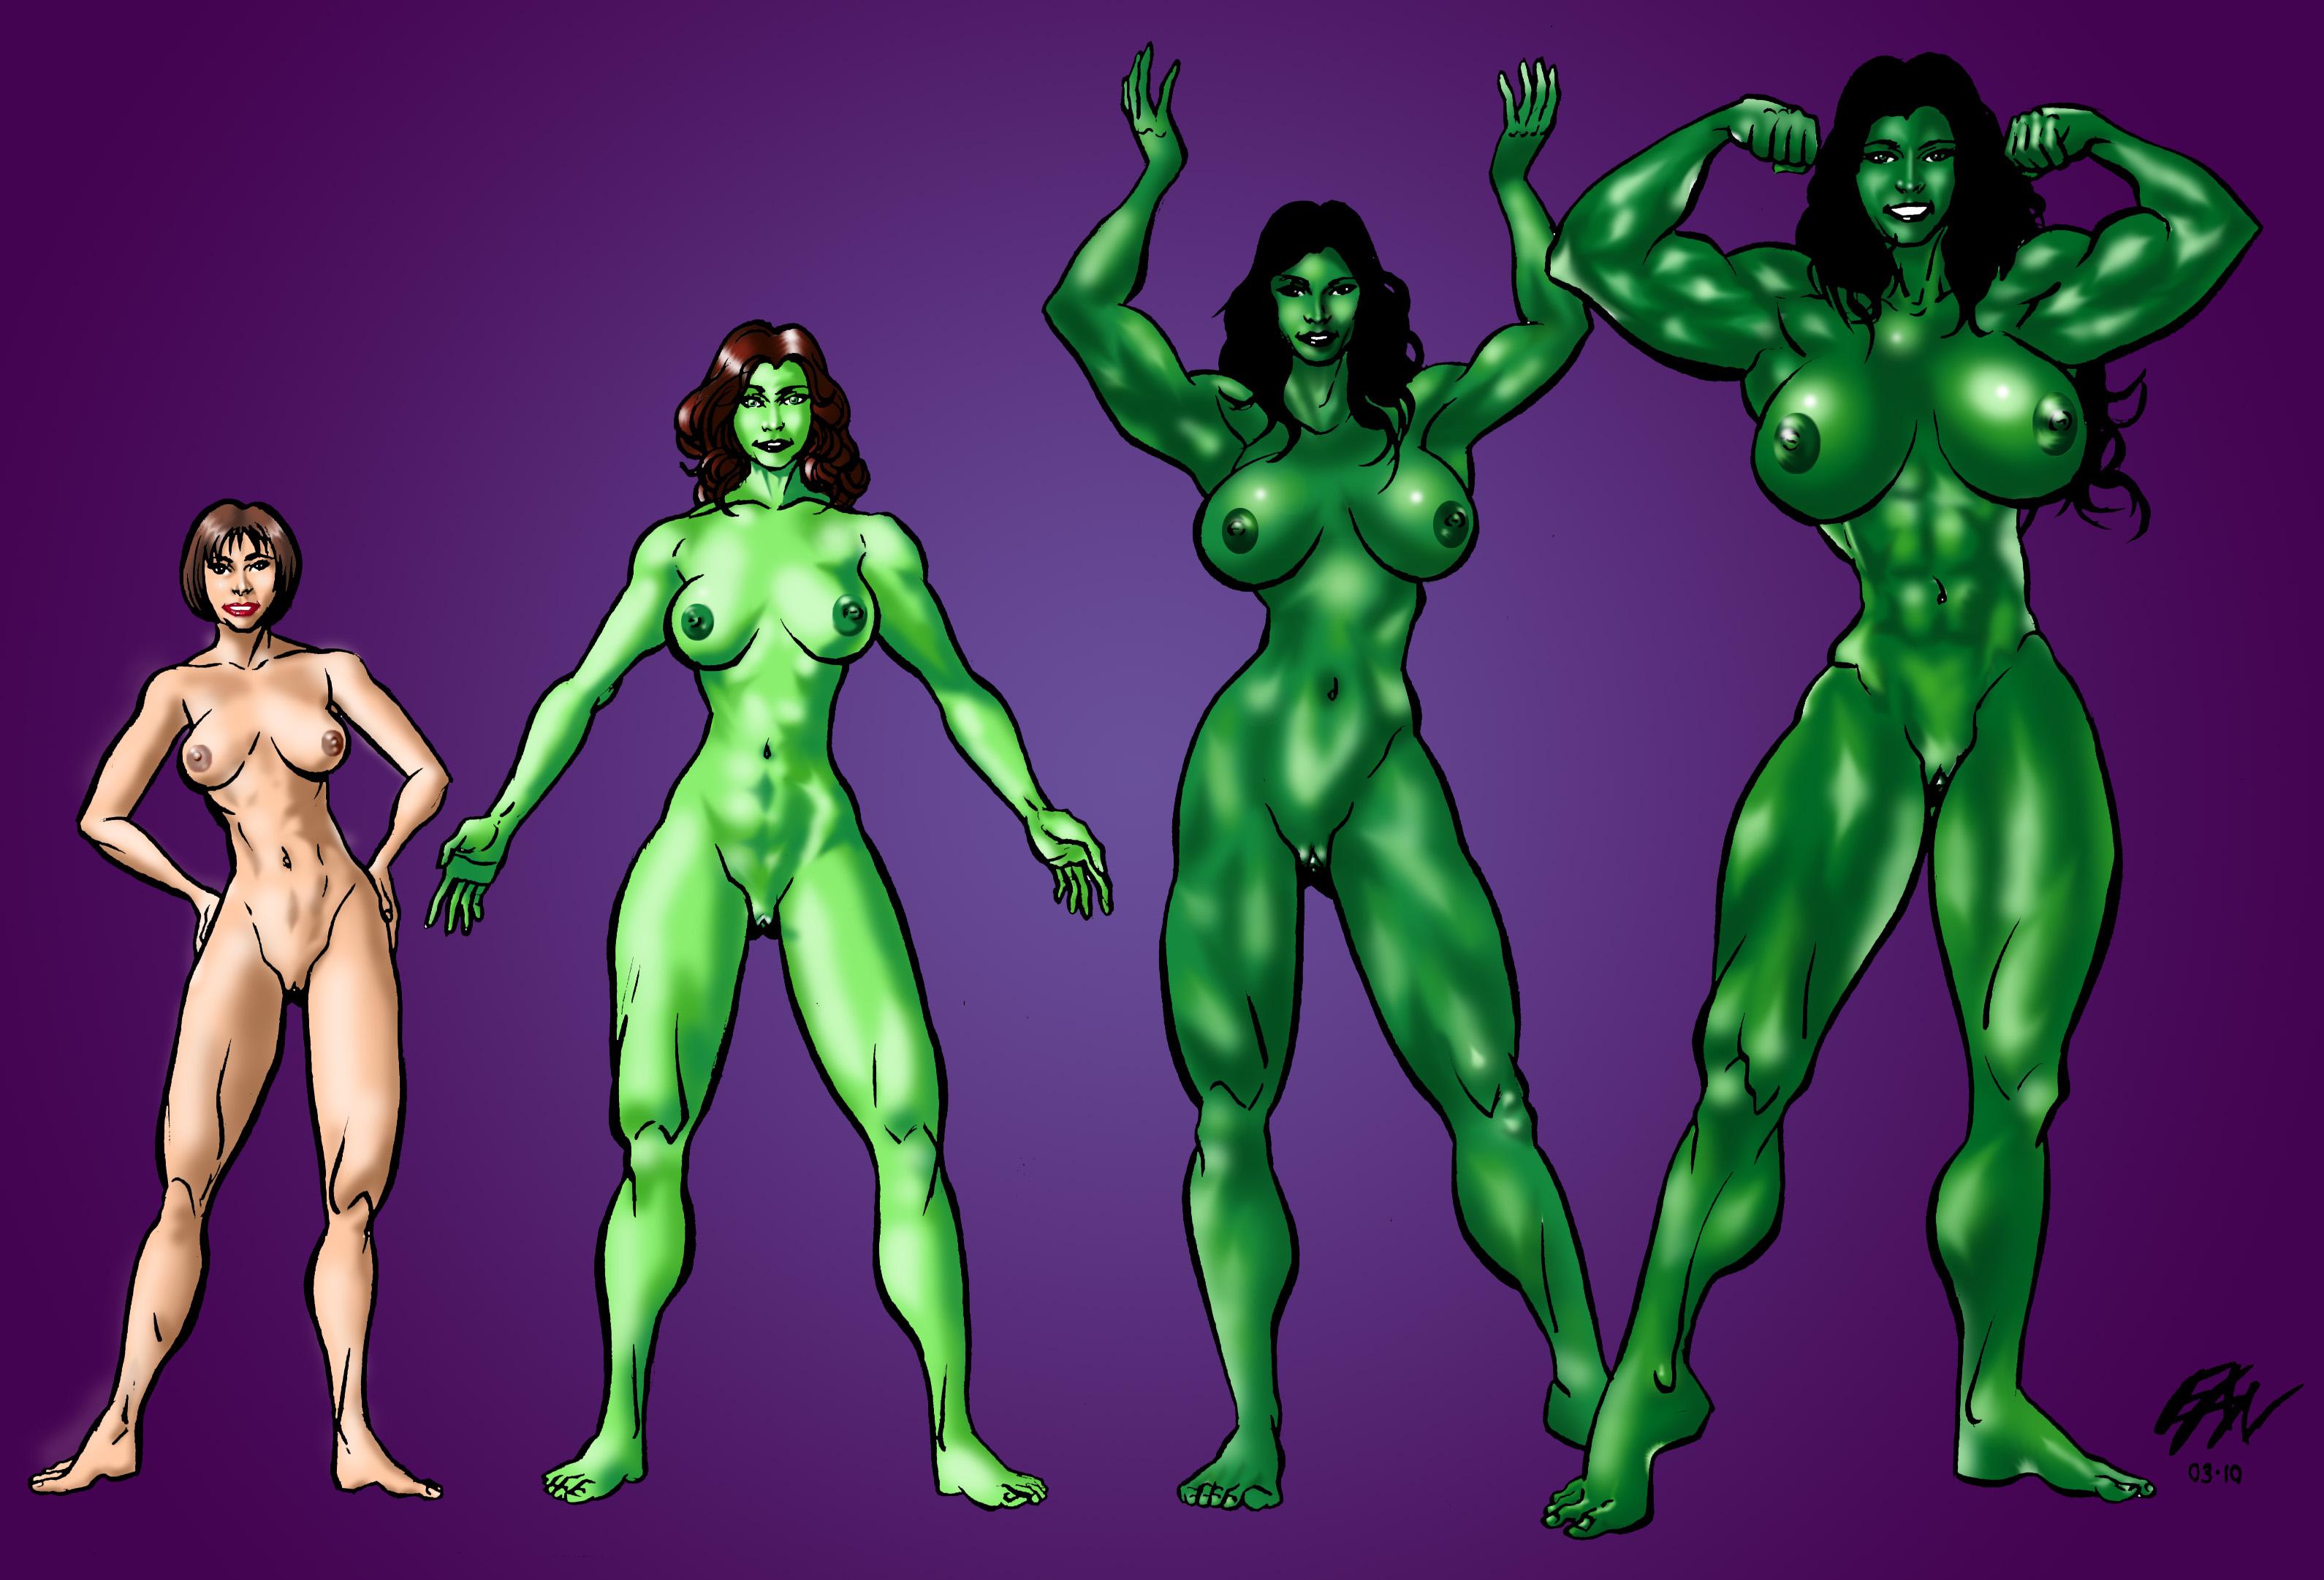 Referent Fjord Prosodie Bananen Marvel Nude Comics Pont Parc Cone